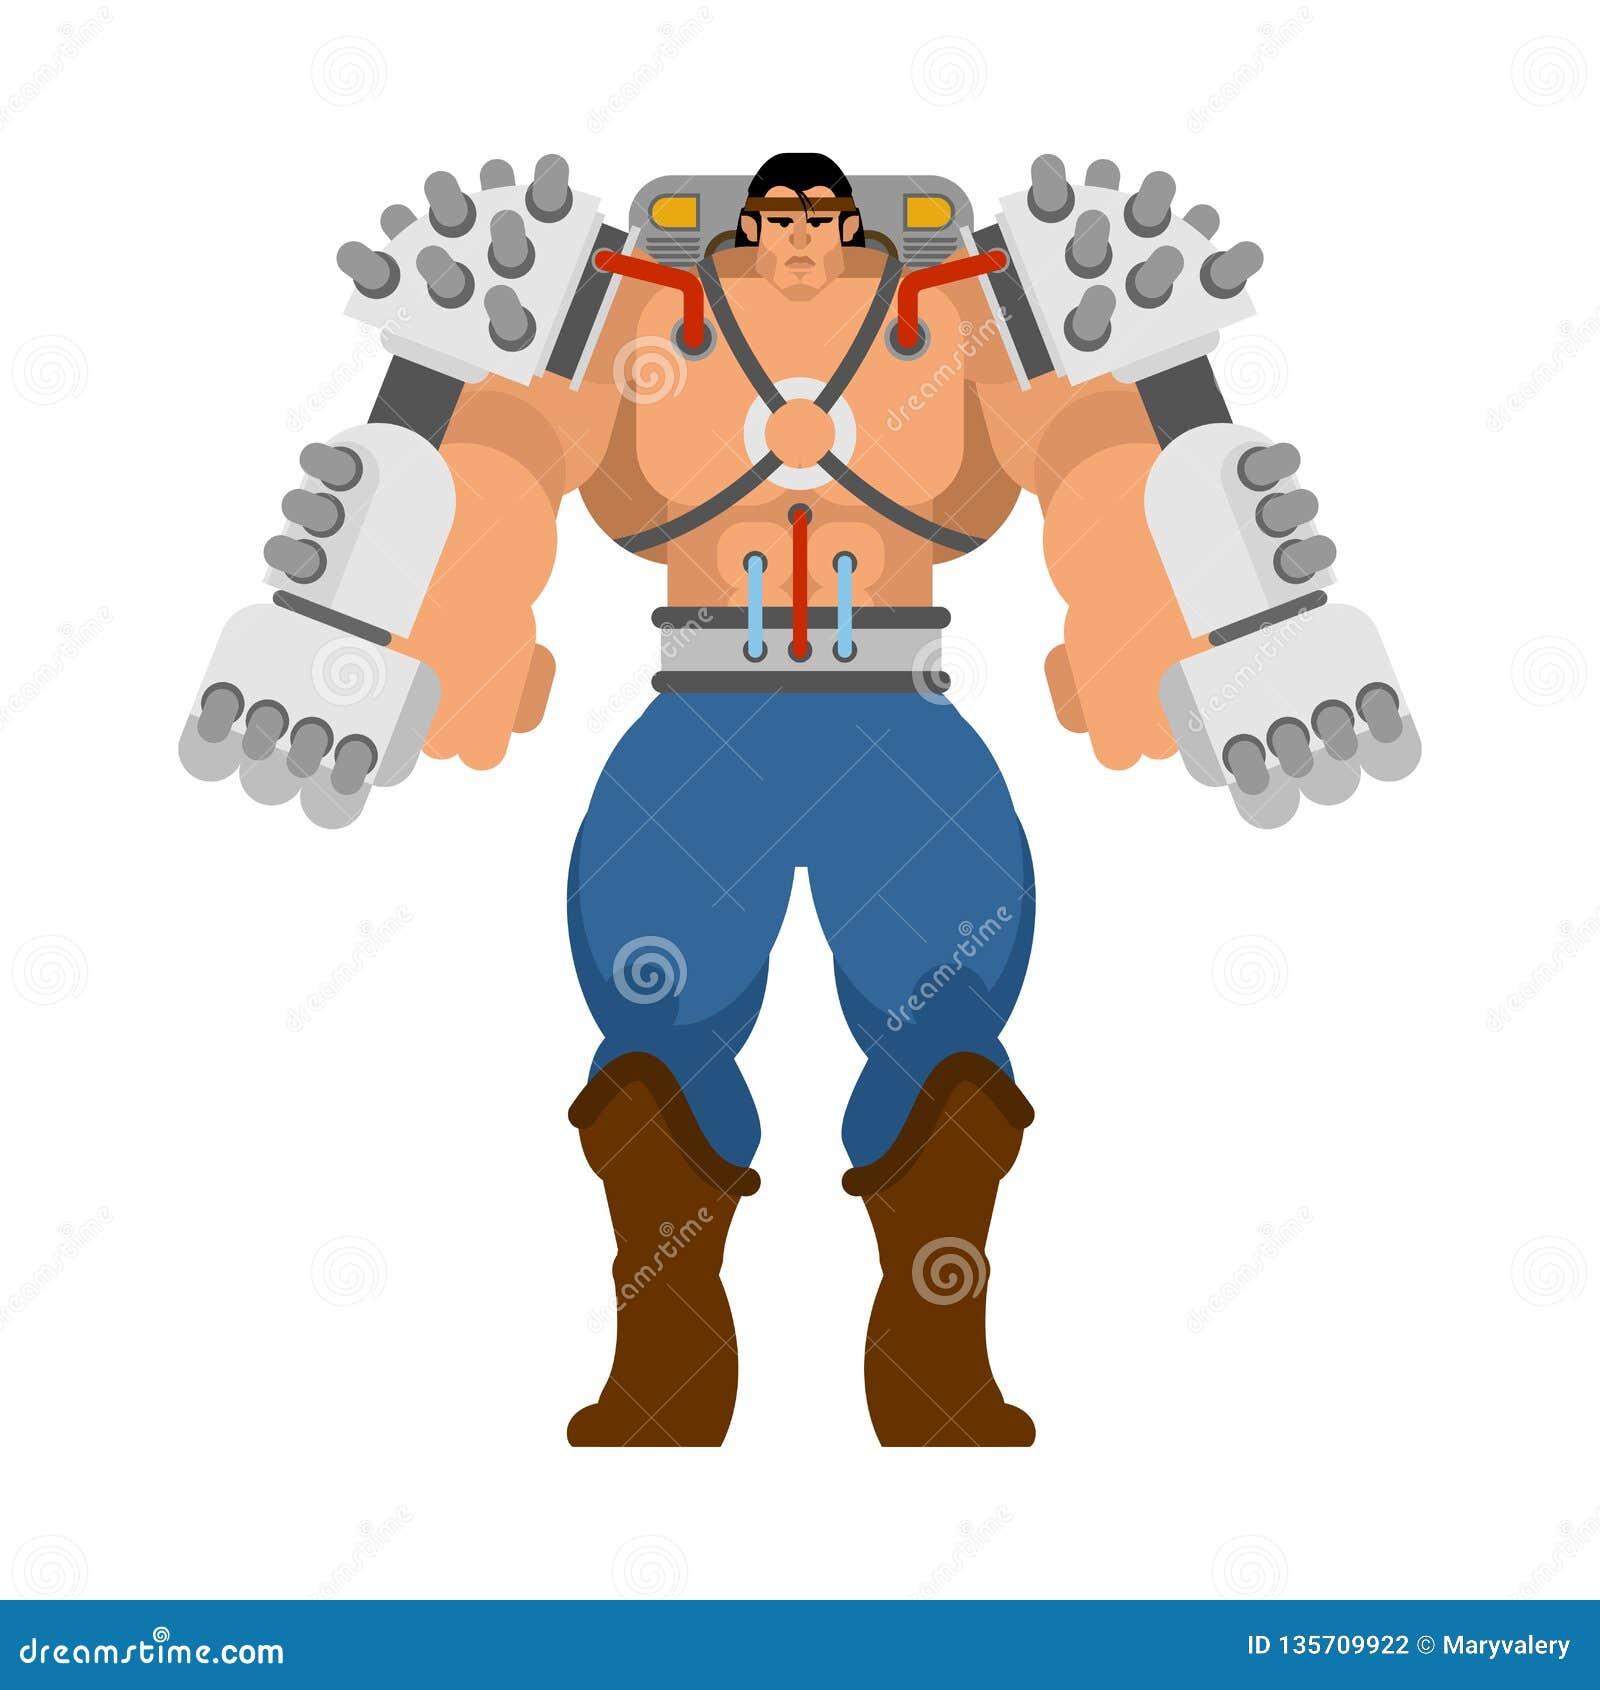 Exoskeleton mechanical technology robotic skeleton. Iron suit robot. Metallic clothing cyborg. Vector illustration